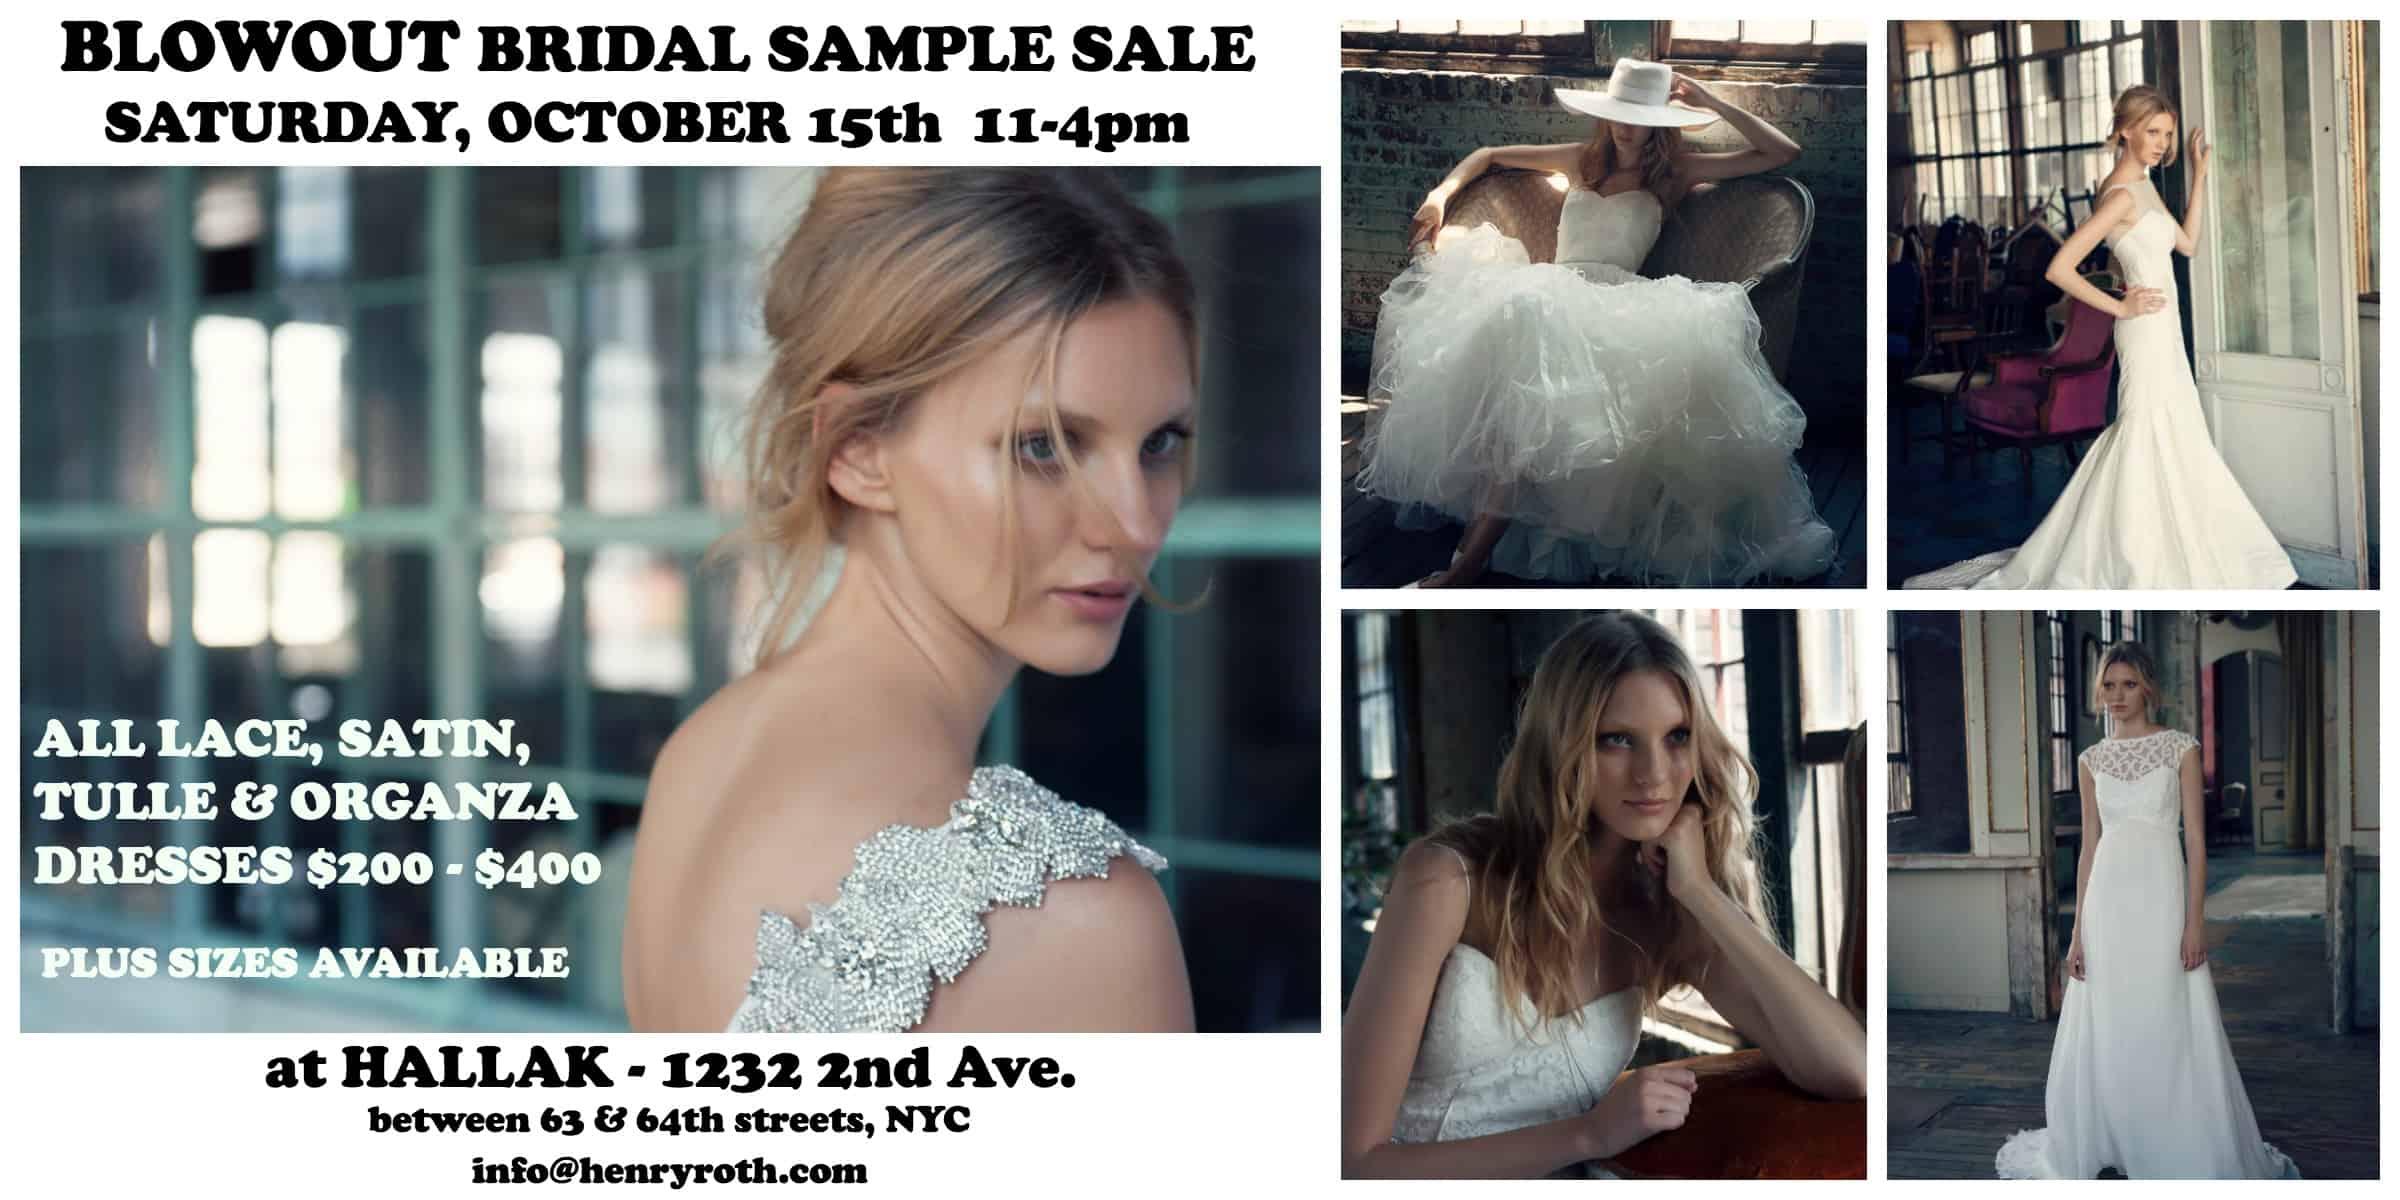 roth bridal sample sale flyer